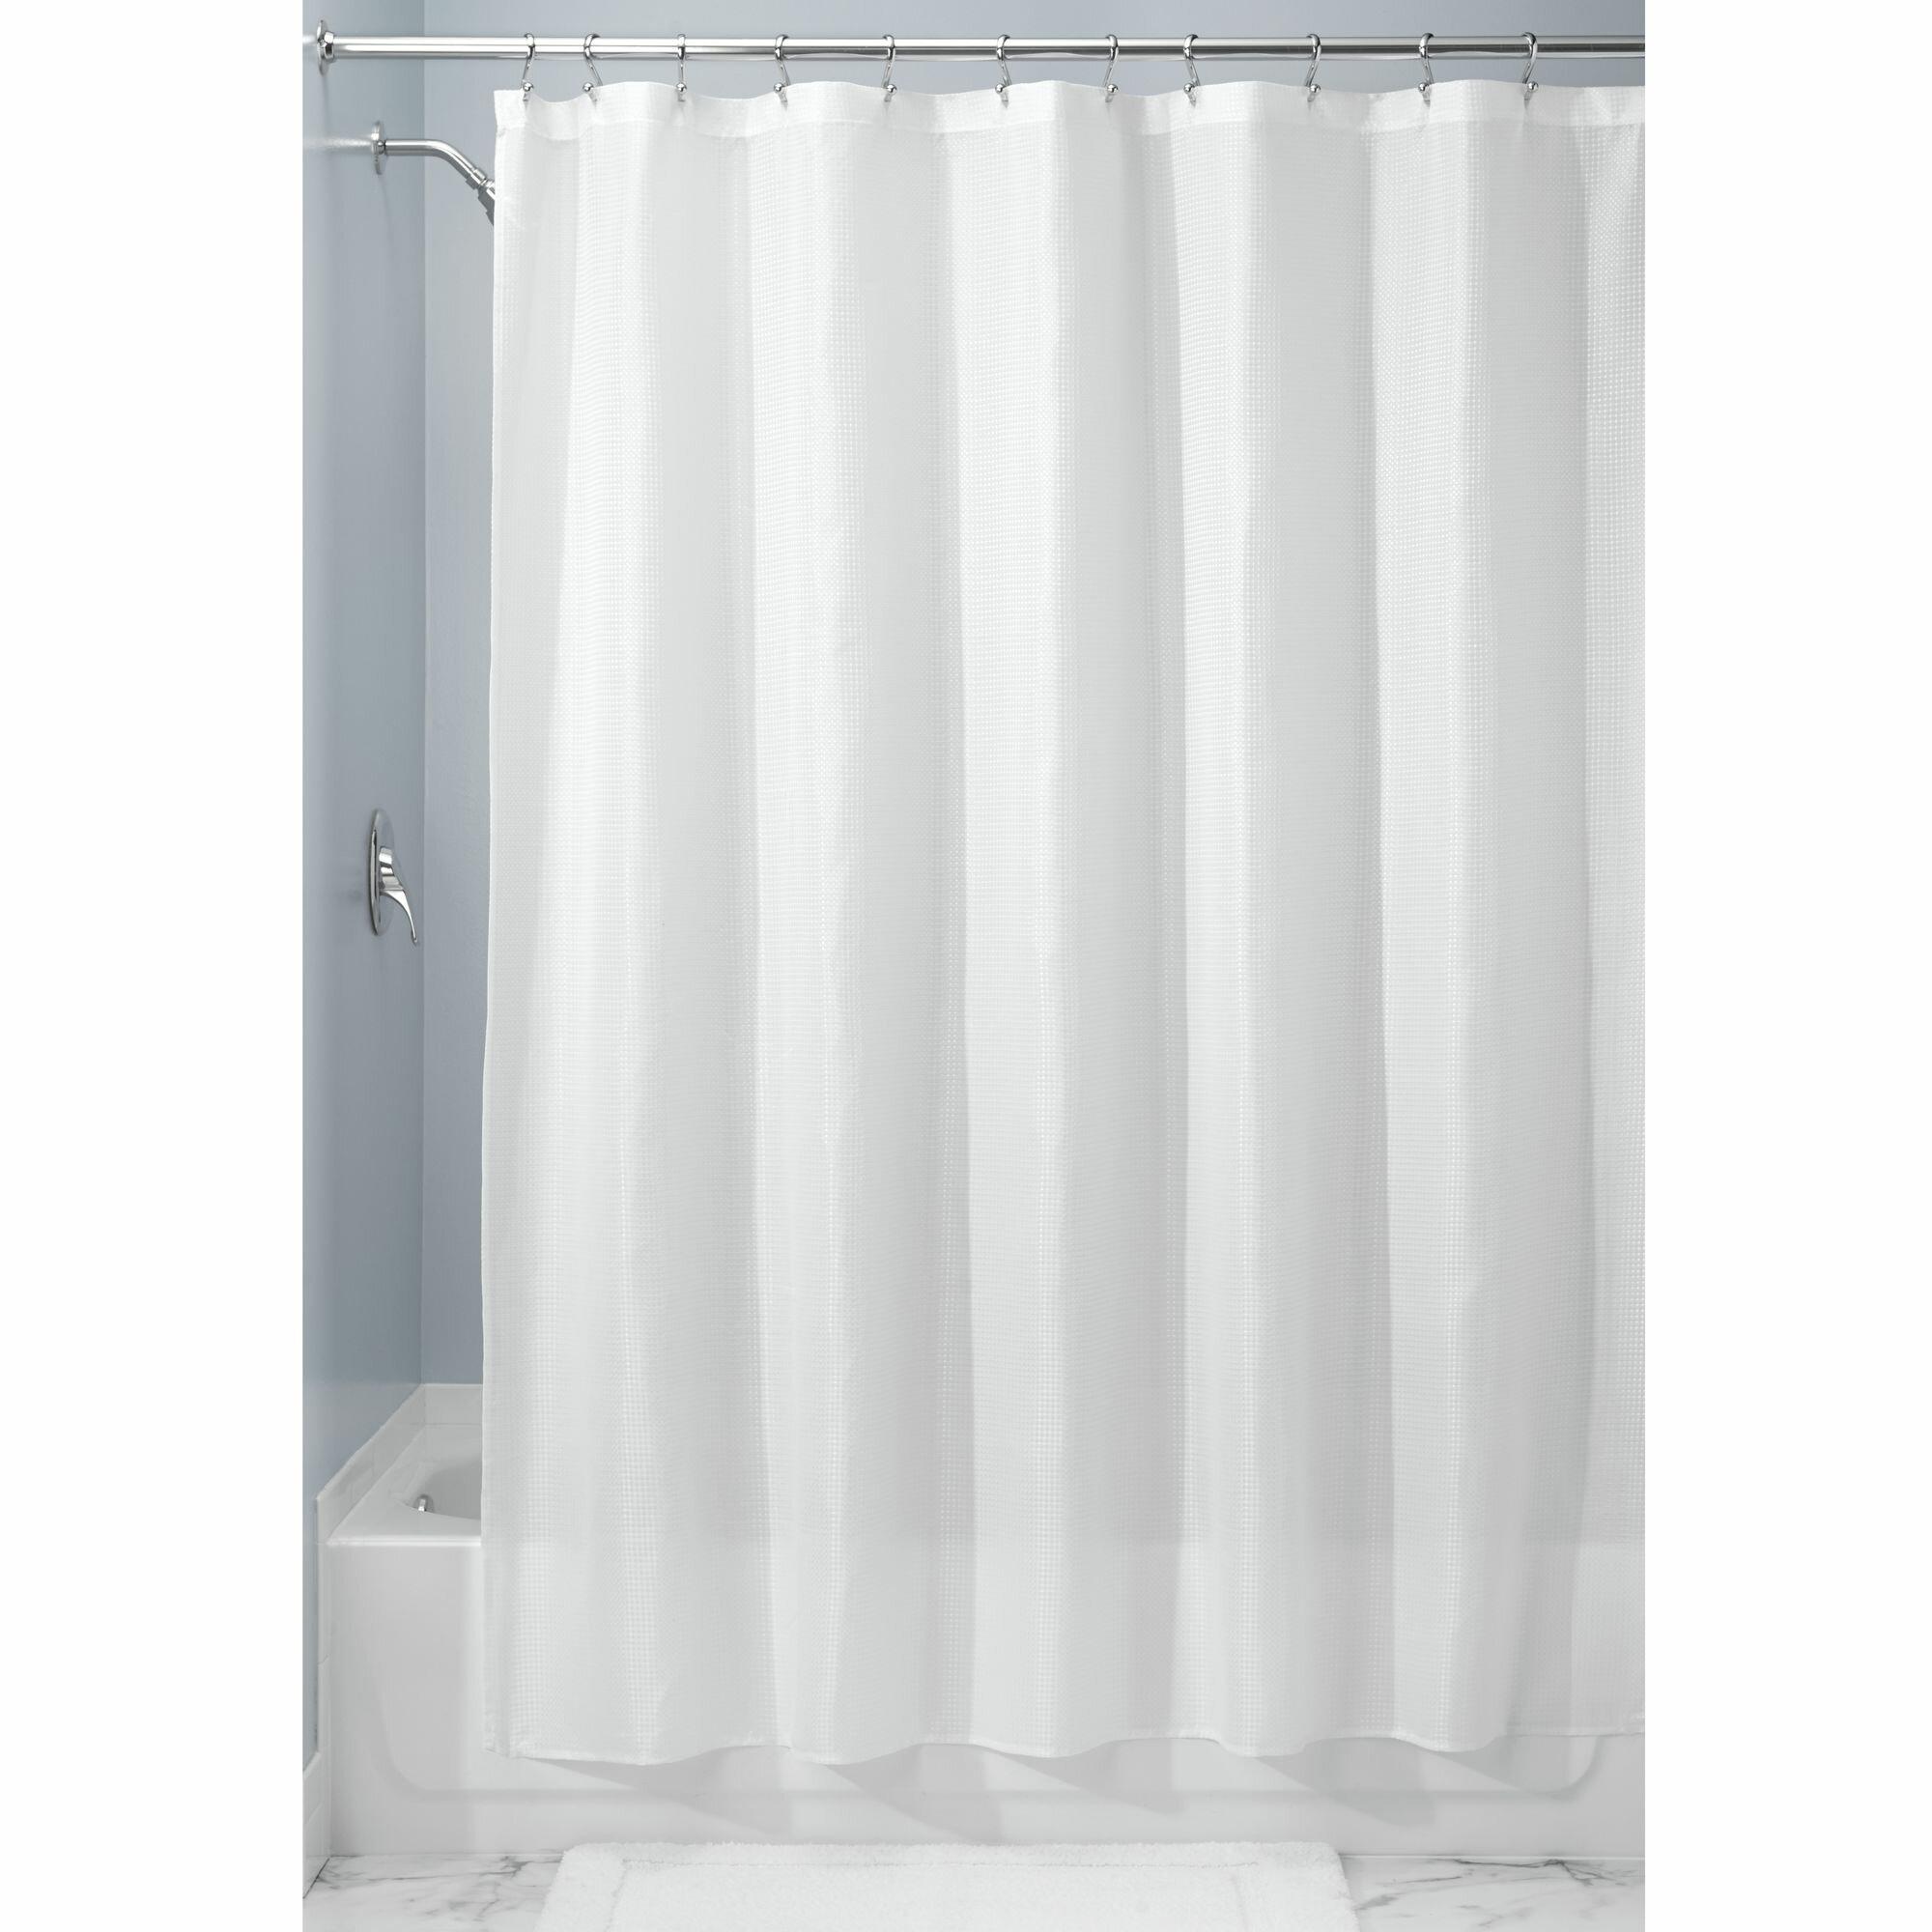 Winston Porter Kilby Shower Curtain & Reviews | Wayfair